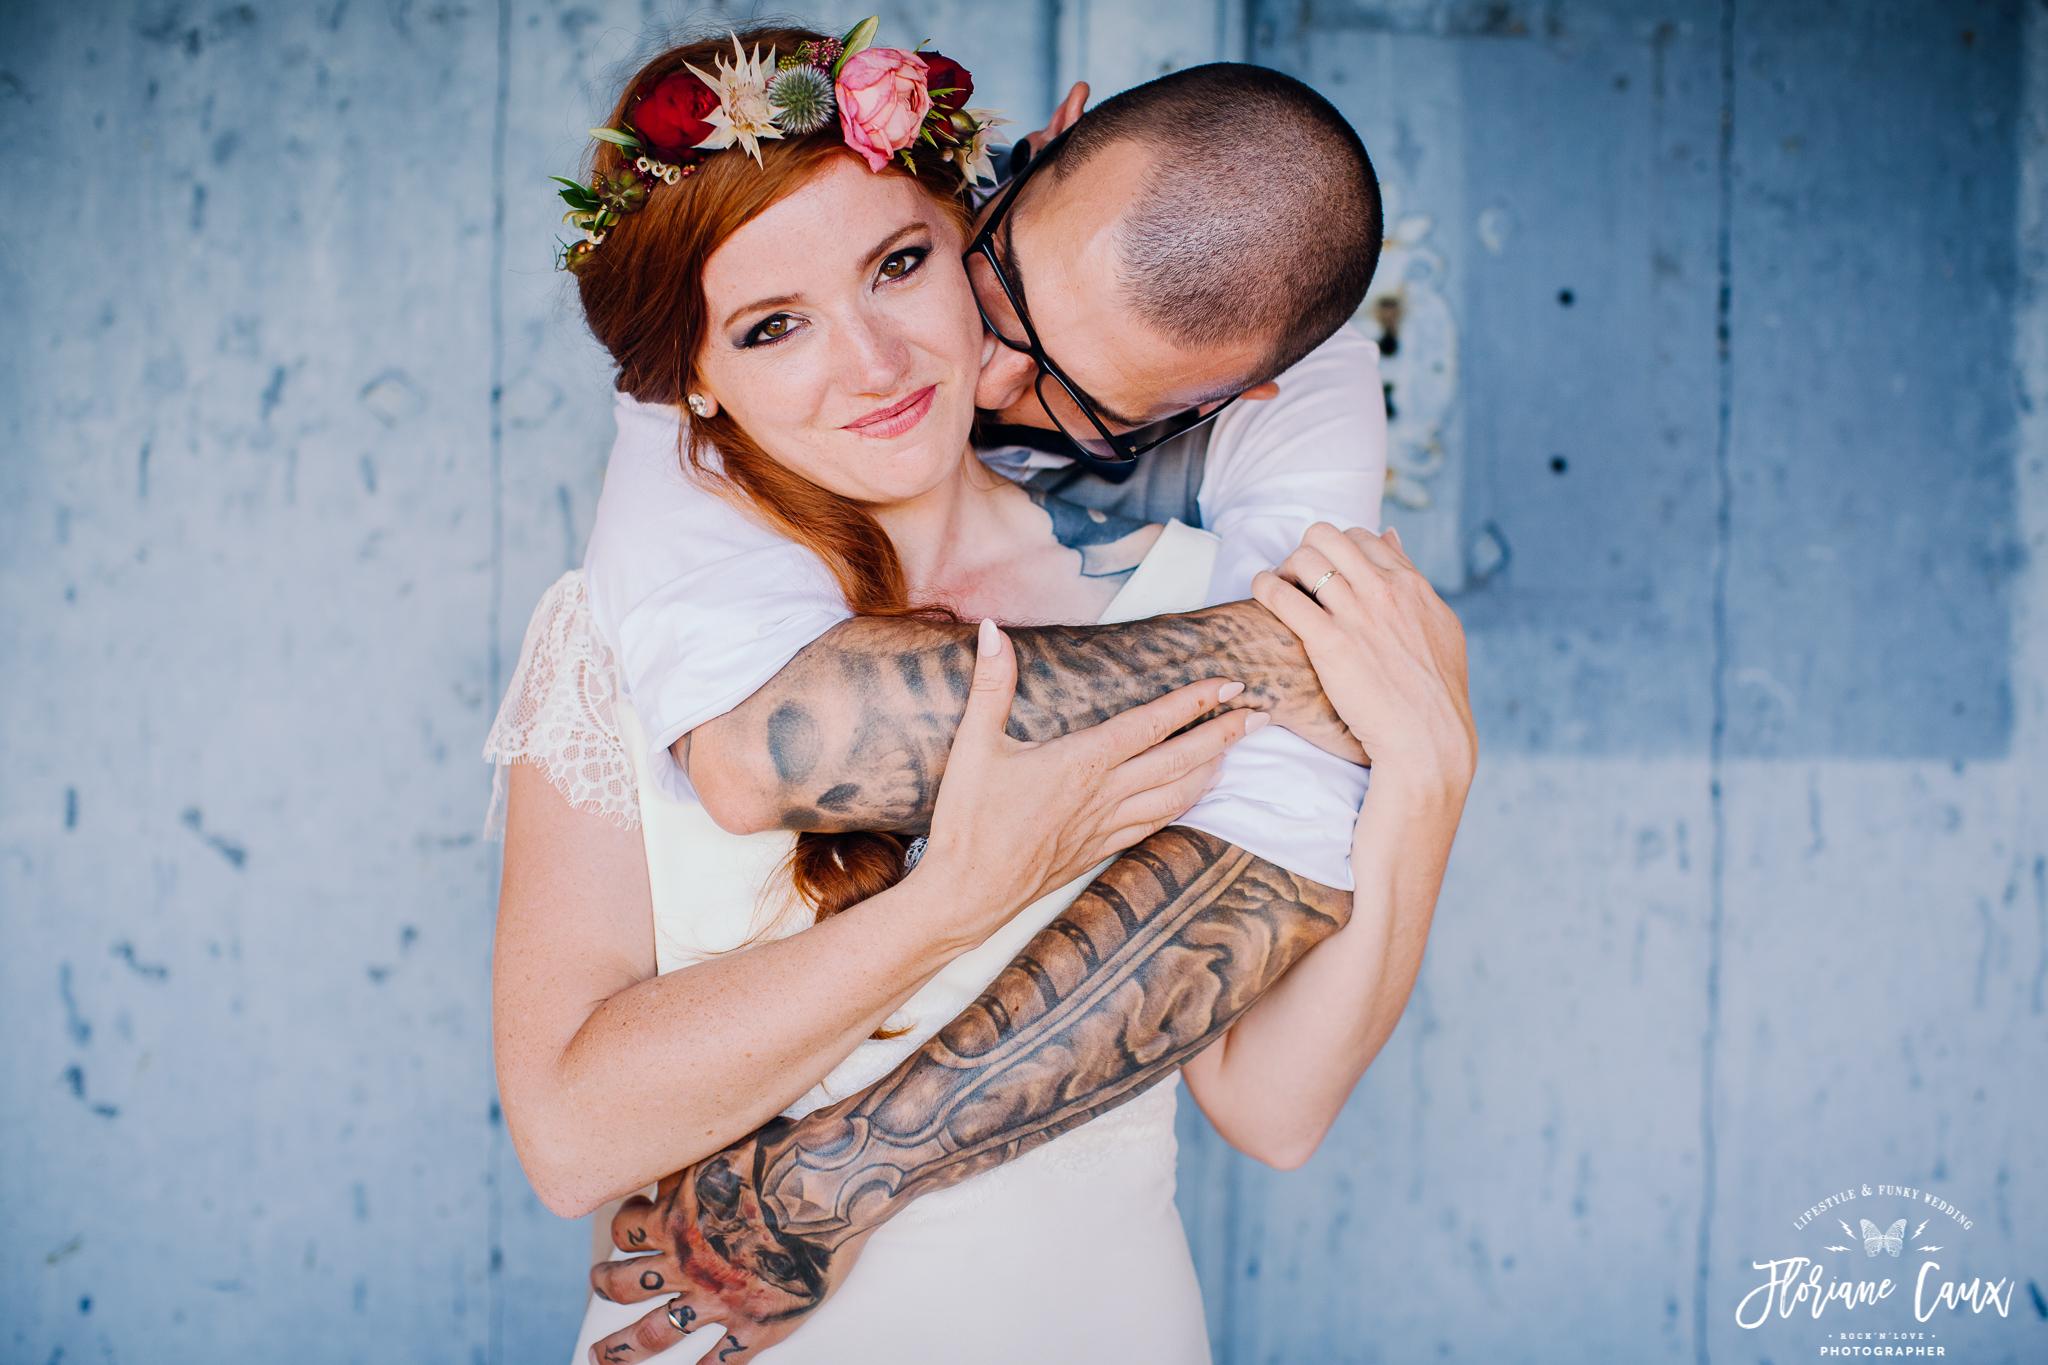 photographe-mariage-toulouse-rocknroll-maries-tatoues-floriane-caux-54